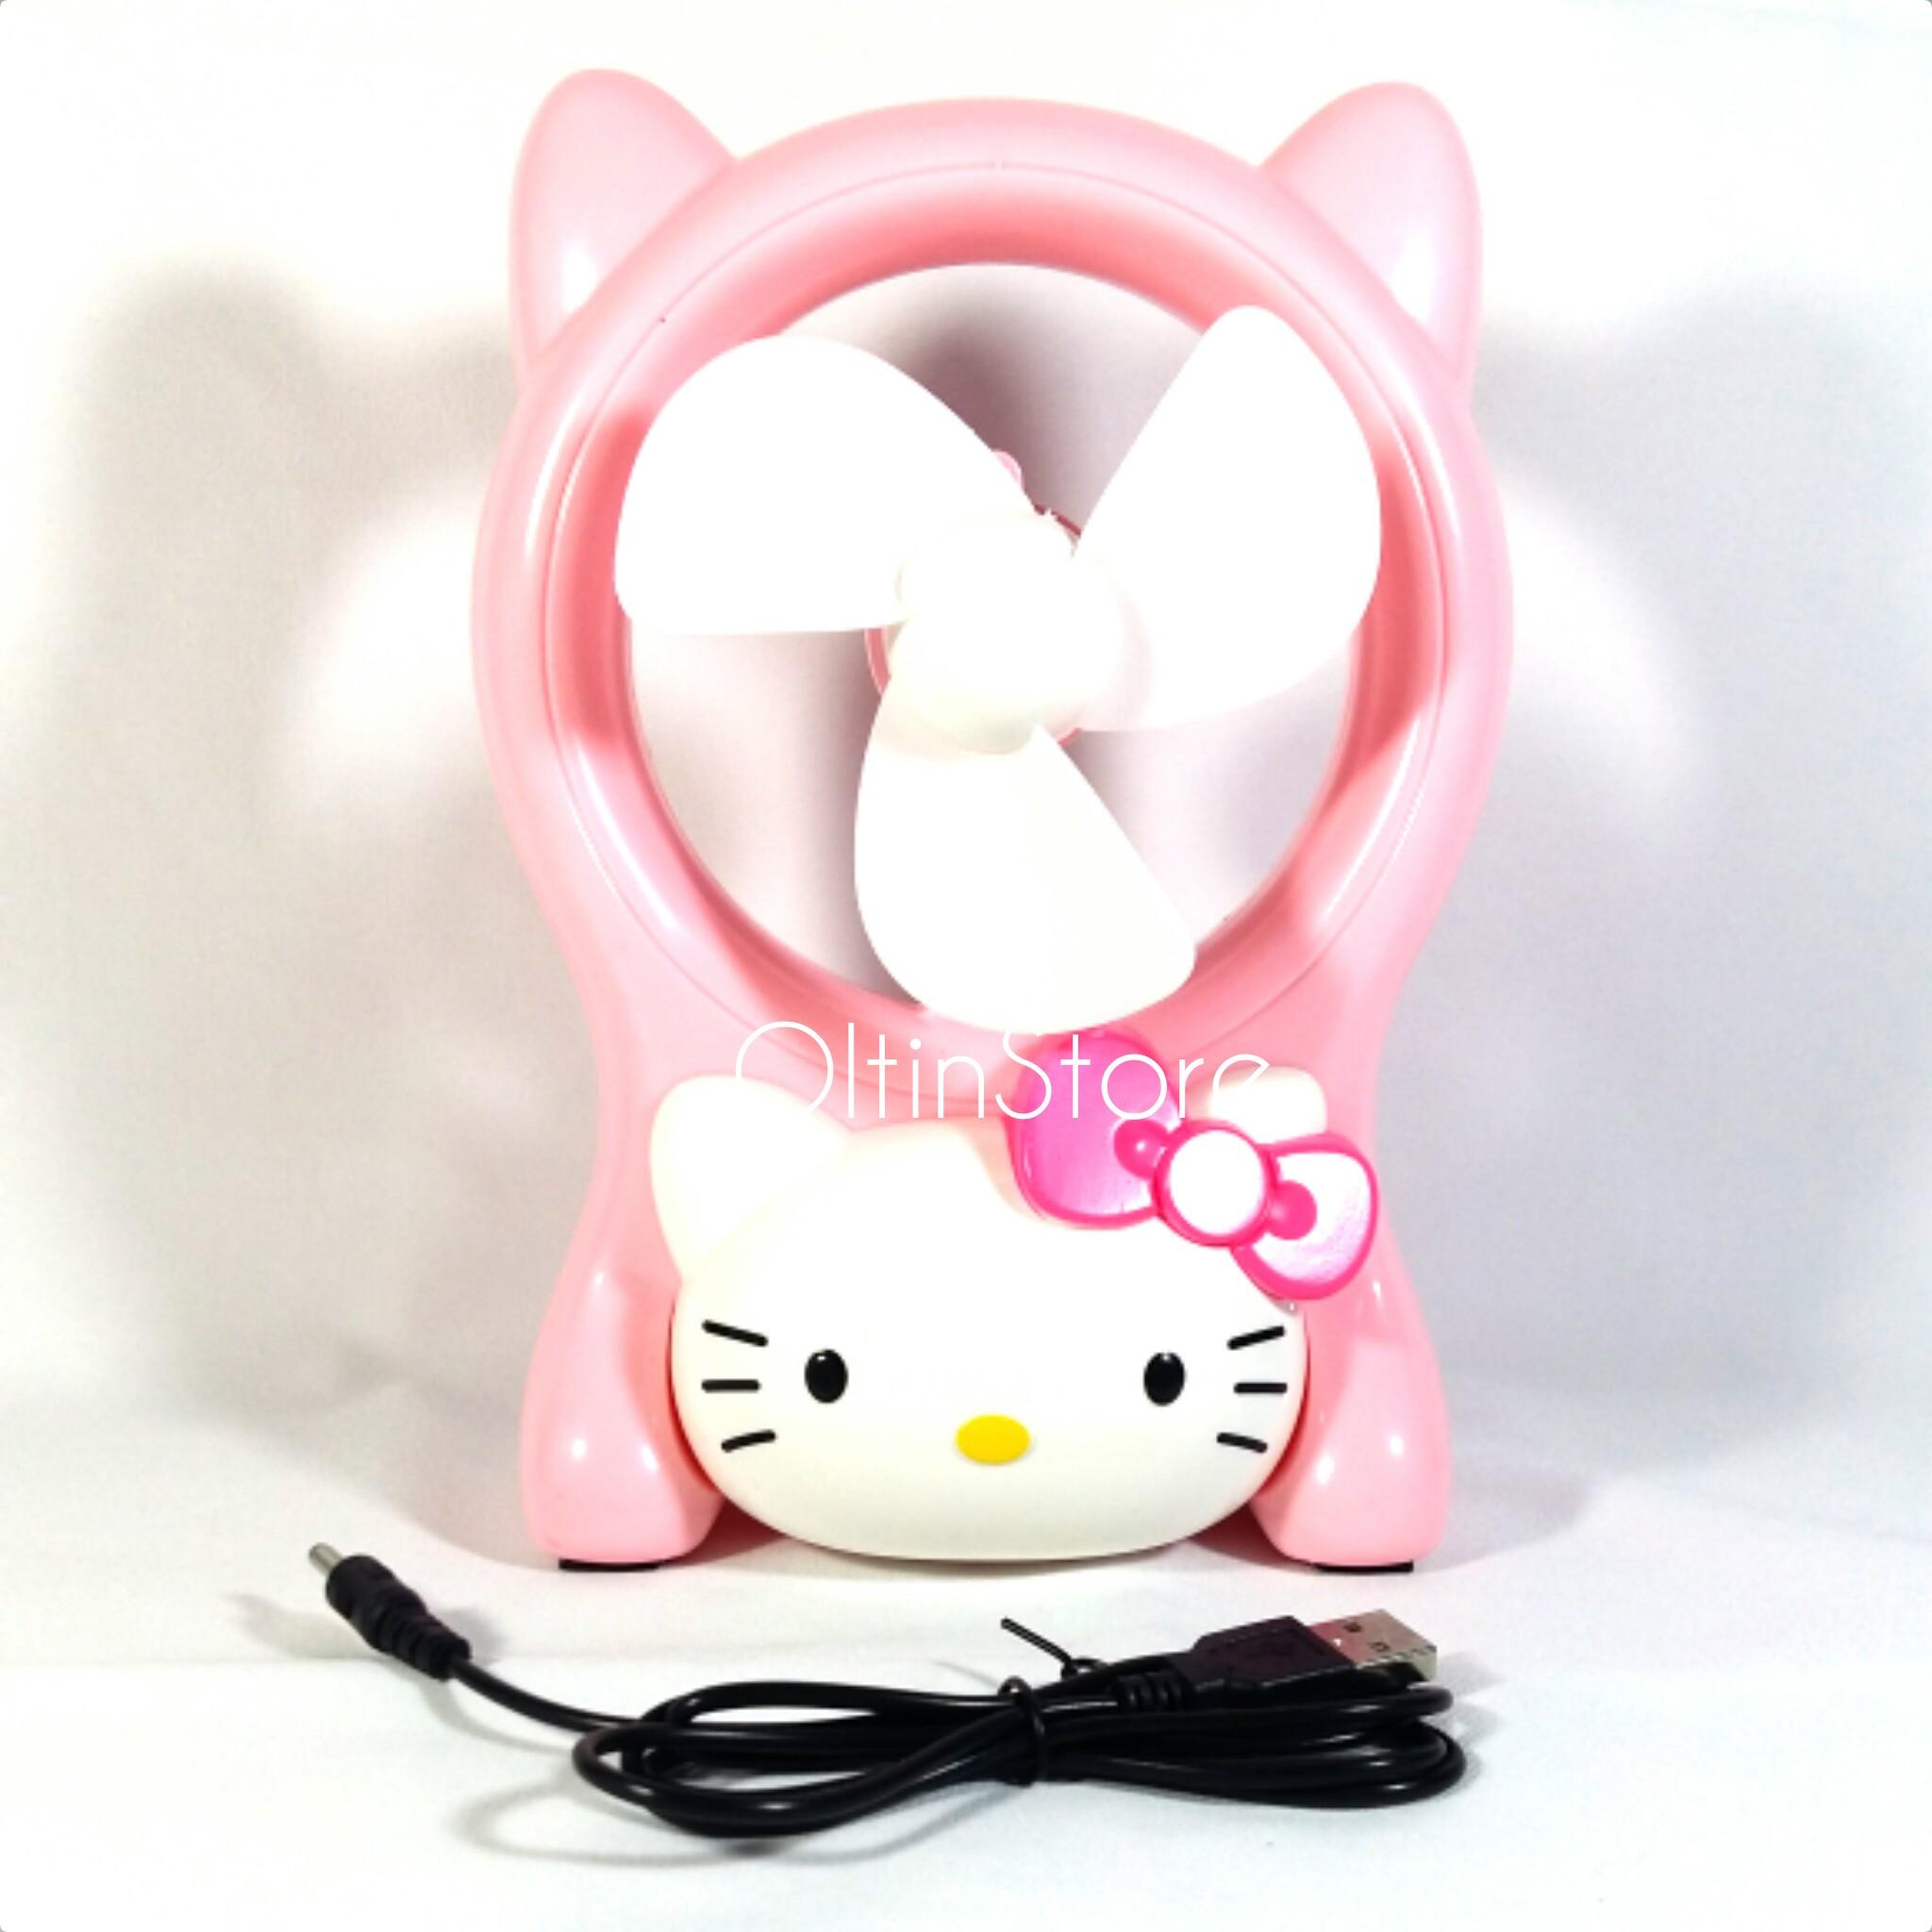 Jual Oltinstore Kipas Angin Mini Portable Usb Hello Kitty Fan Oltinestore Tokopedia